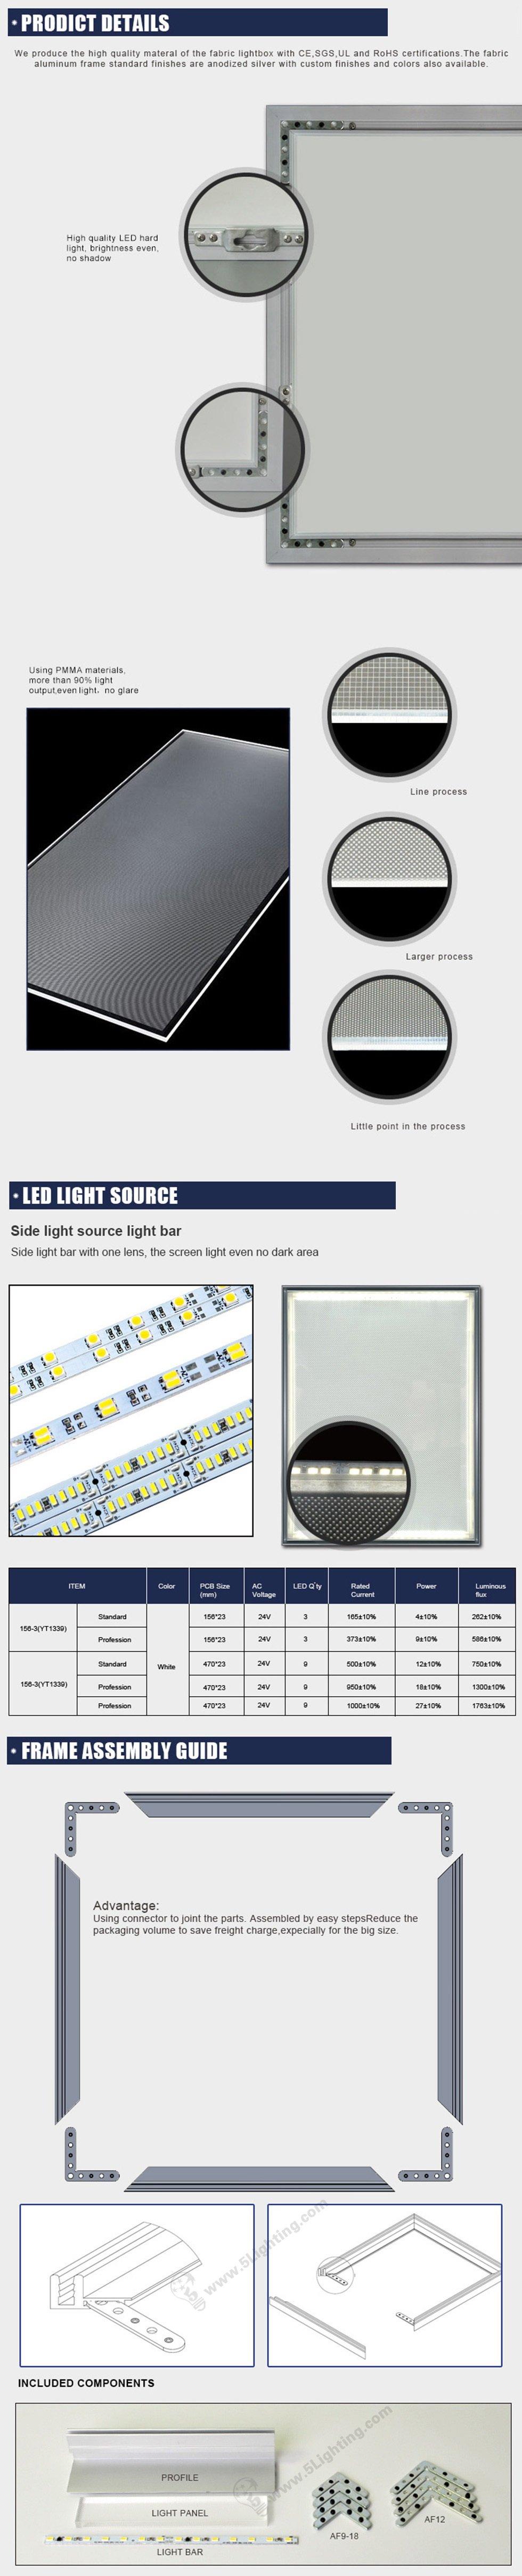 ultra slim fabric light box edge lit